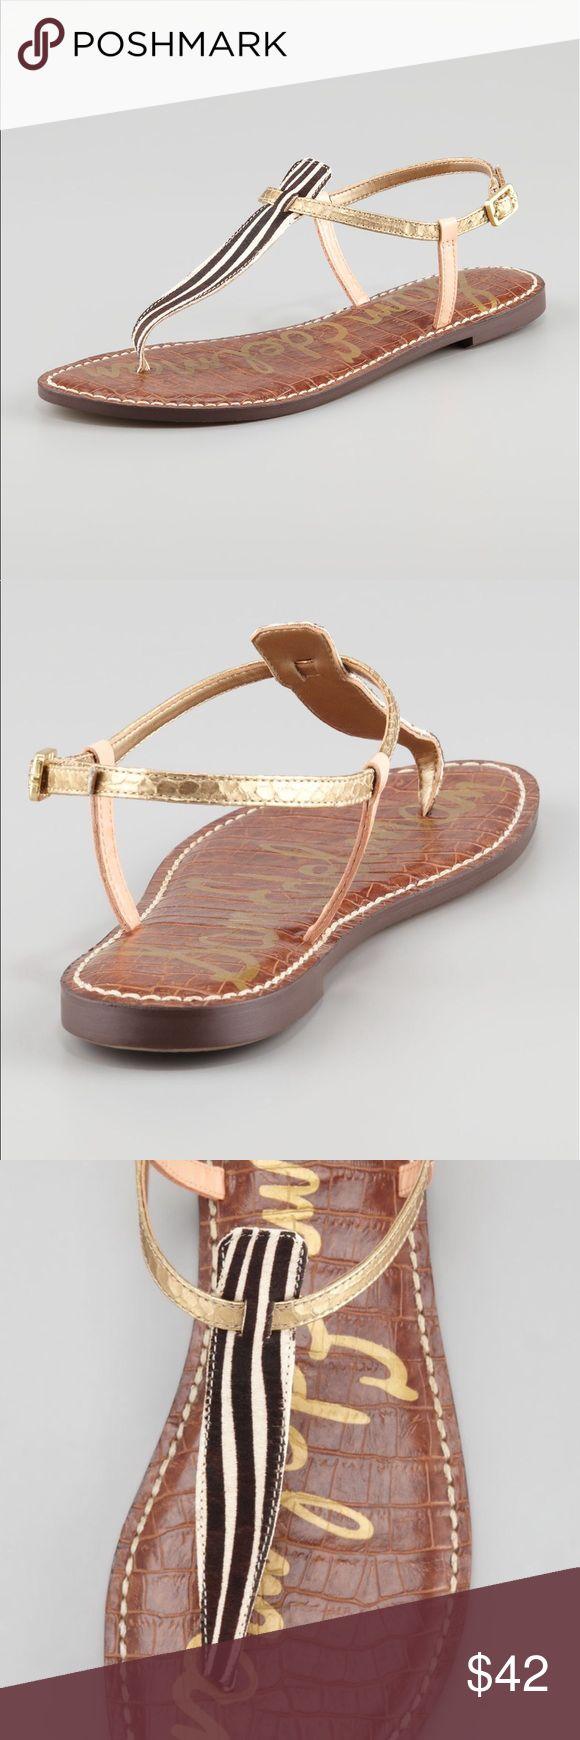 "Sam Edelman Gigi Sandals Size 6.5 Brand New Authentic Sam Edelman Gigi Dyed Calf Fur  Size: 6.5 M  1/2 "" heel Sam Edelman Shoes Sandals"